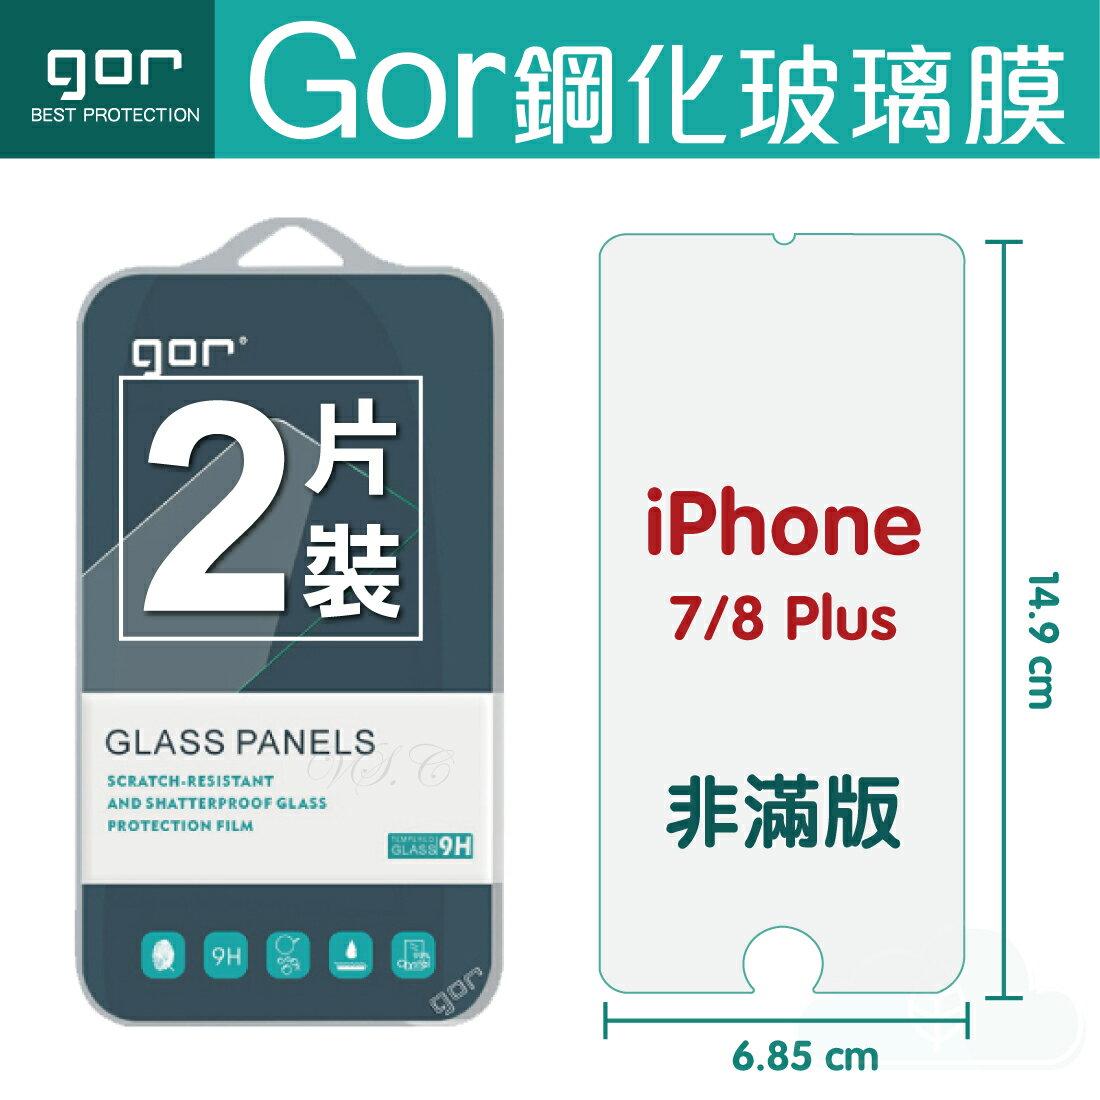 【Apple】GOR 9H iPhone 7 Plus / 8 Plus 鋼化 玻璃 保護貼 全透明非滿版 兩片裝 【全館滿299免運費】